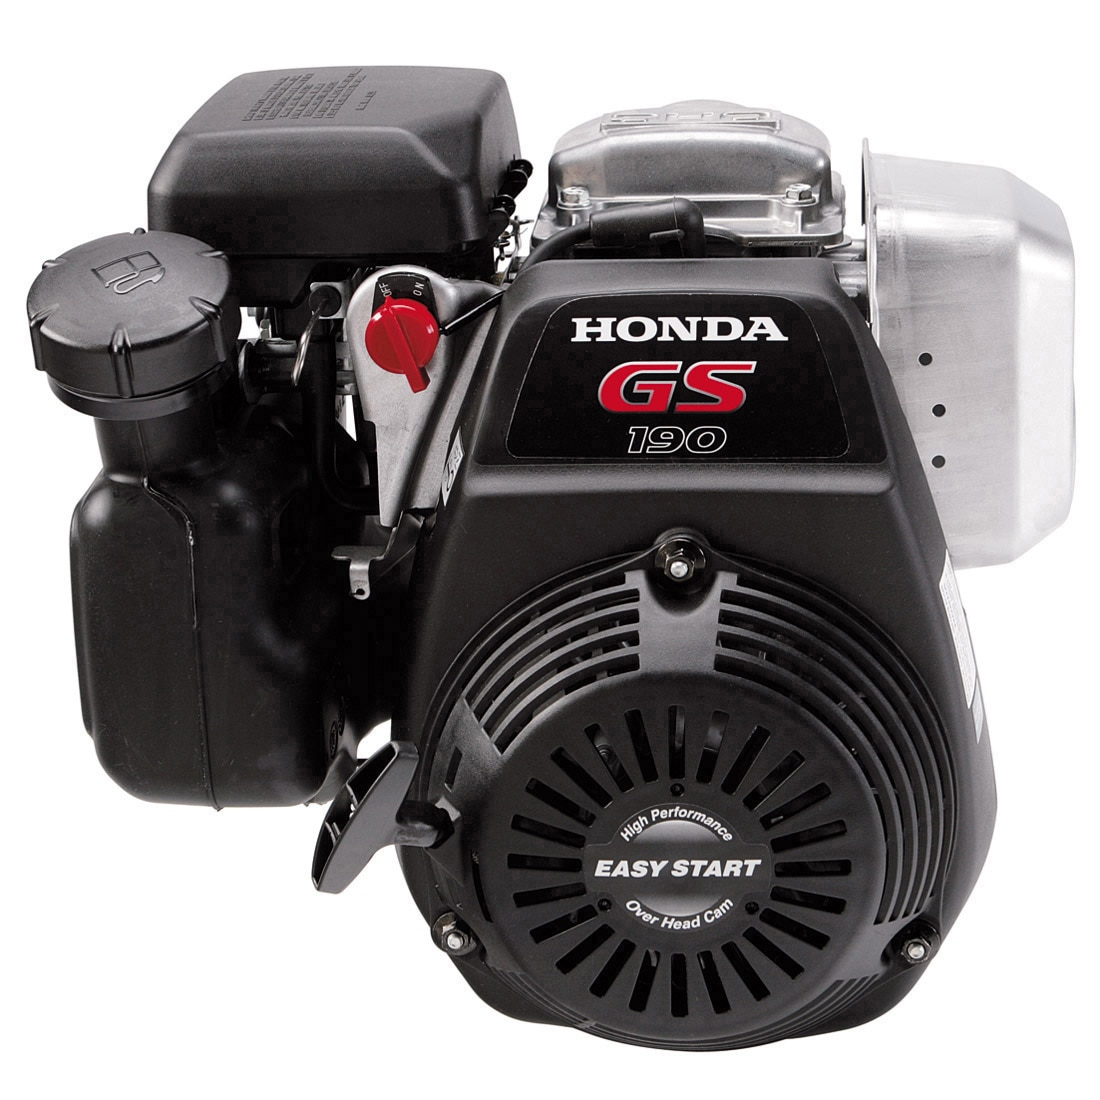 Honda Engines | Small Engine Models, Manuals, Parts ... on